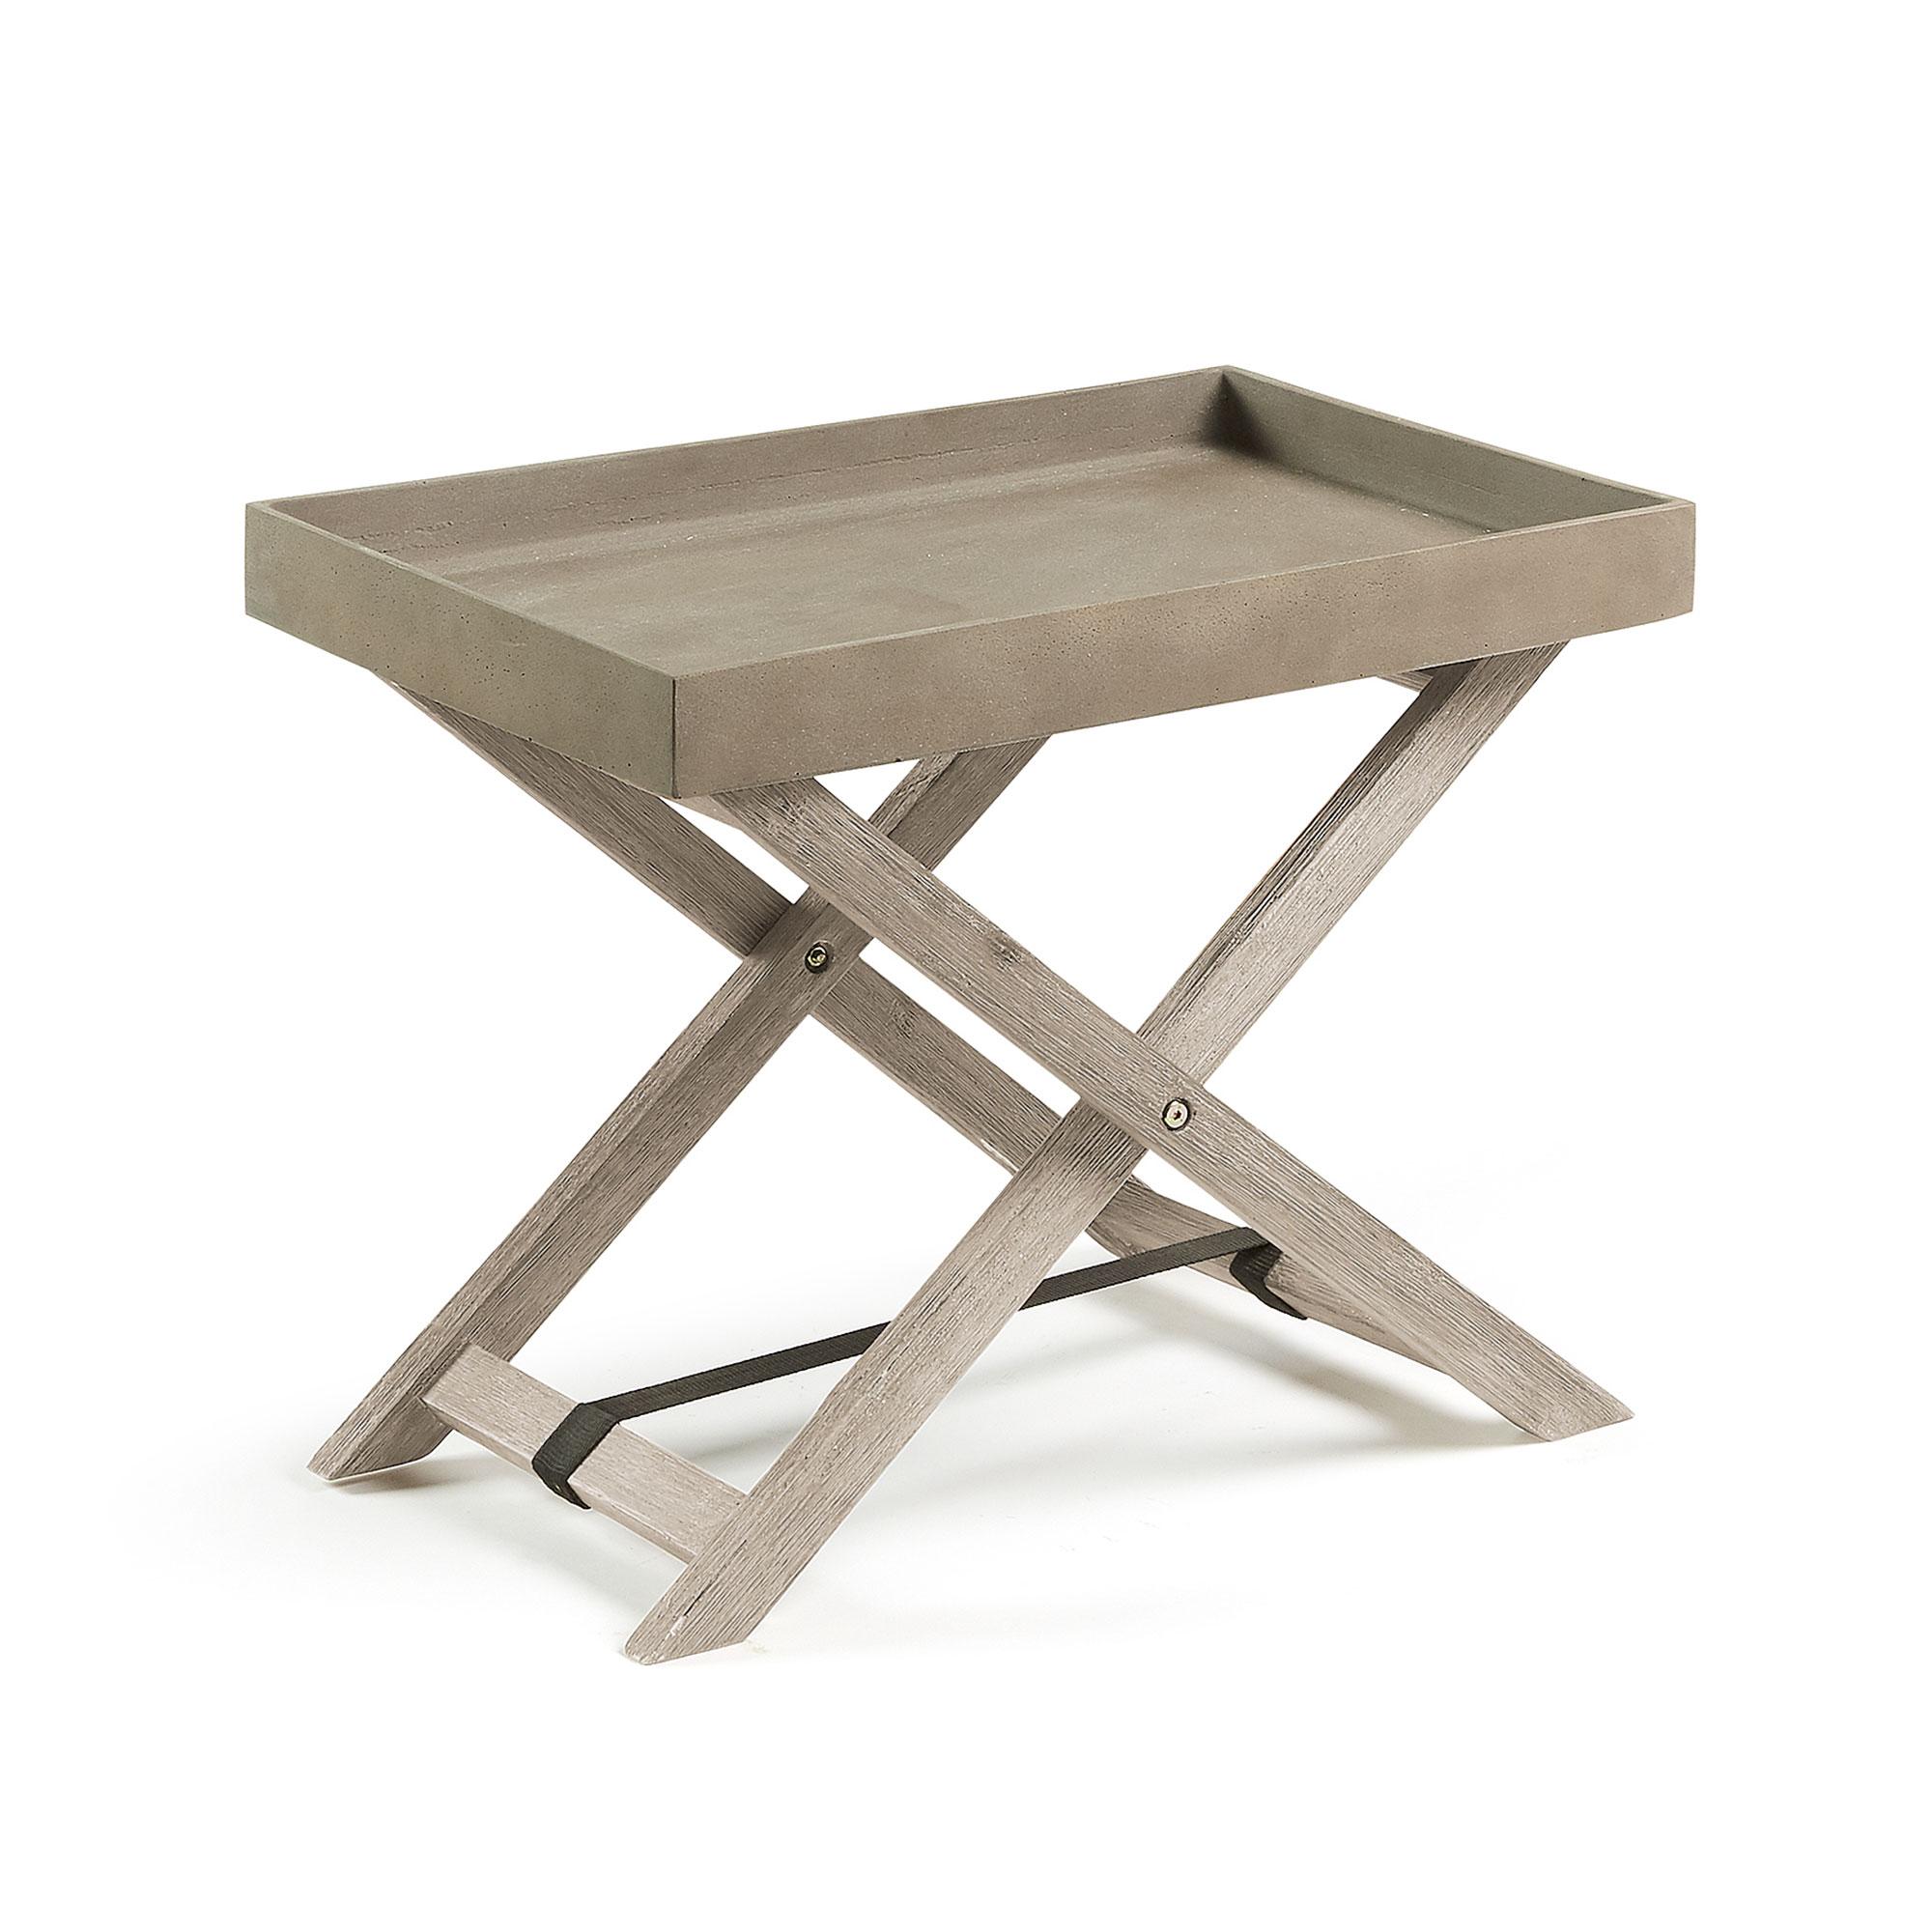 laforma – Laforma stahl bakkebord - rustbrun/natur cement/akacietræ (55x35) på boboonline.dk